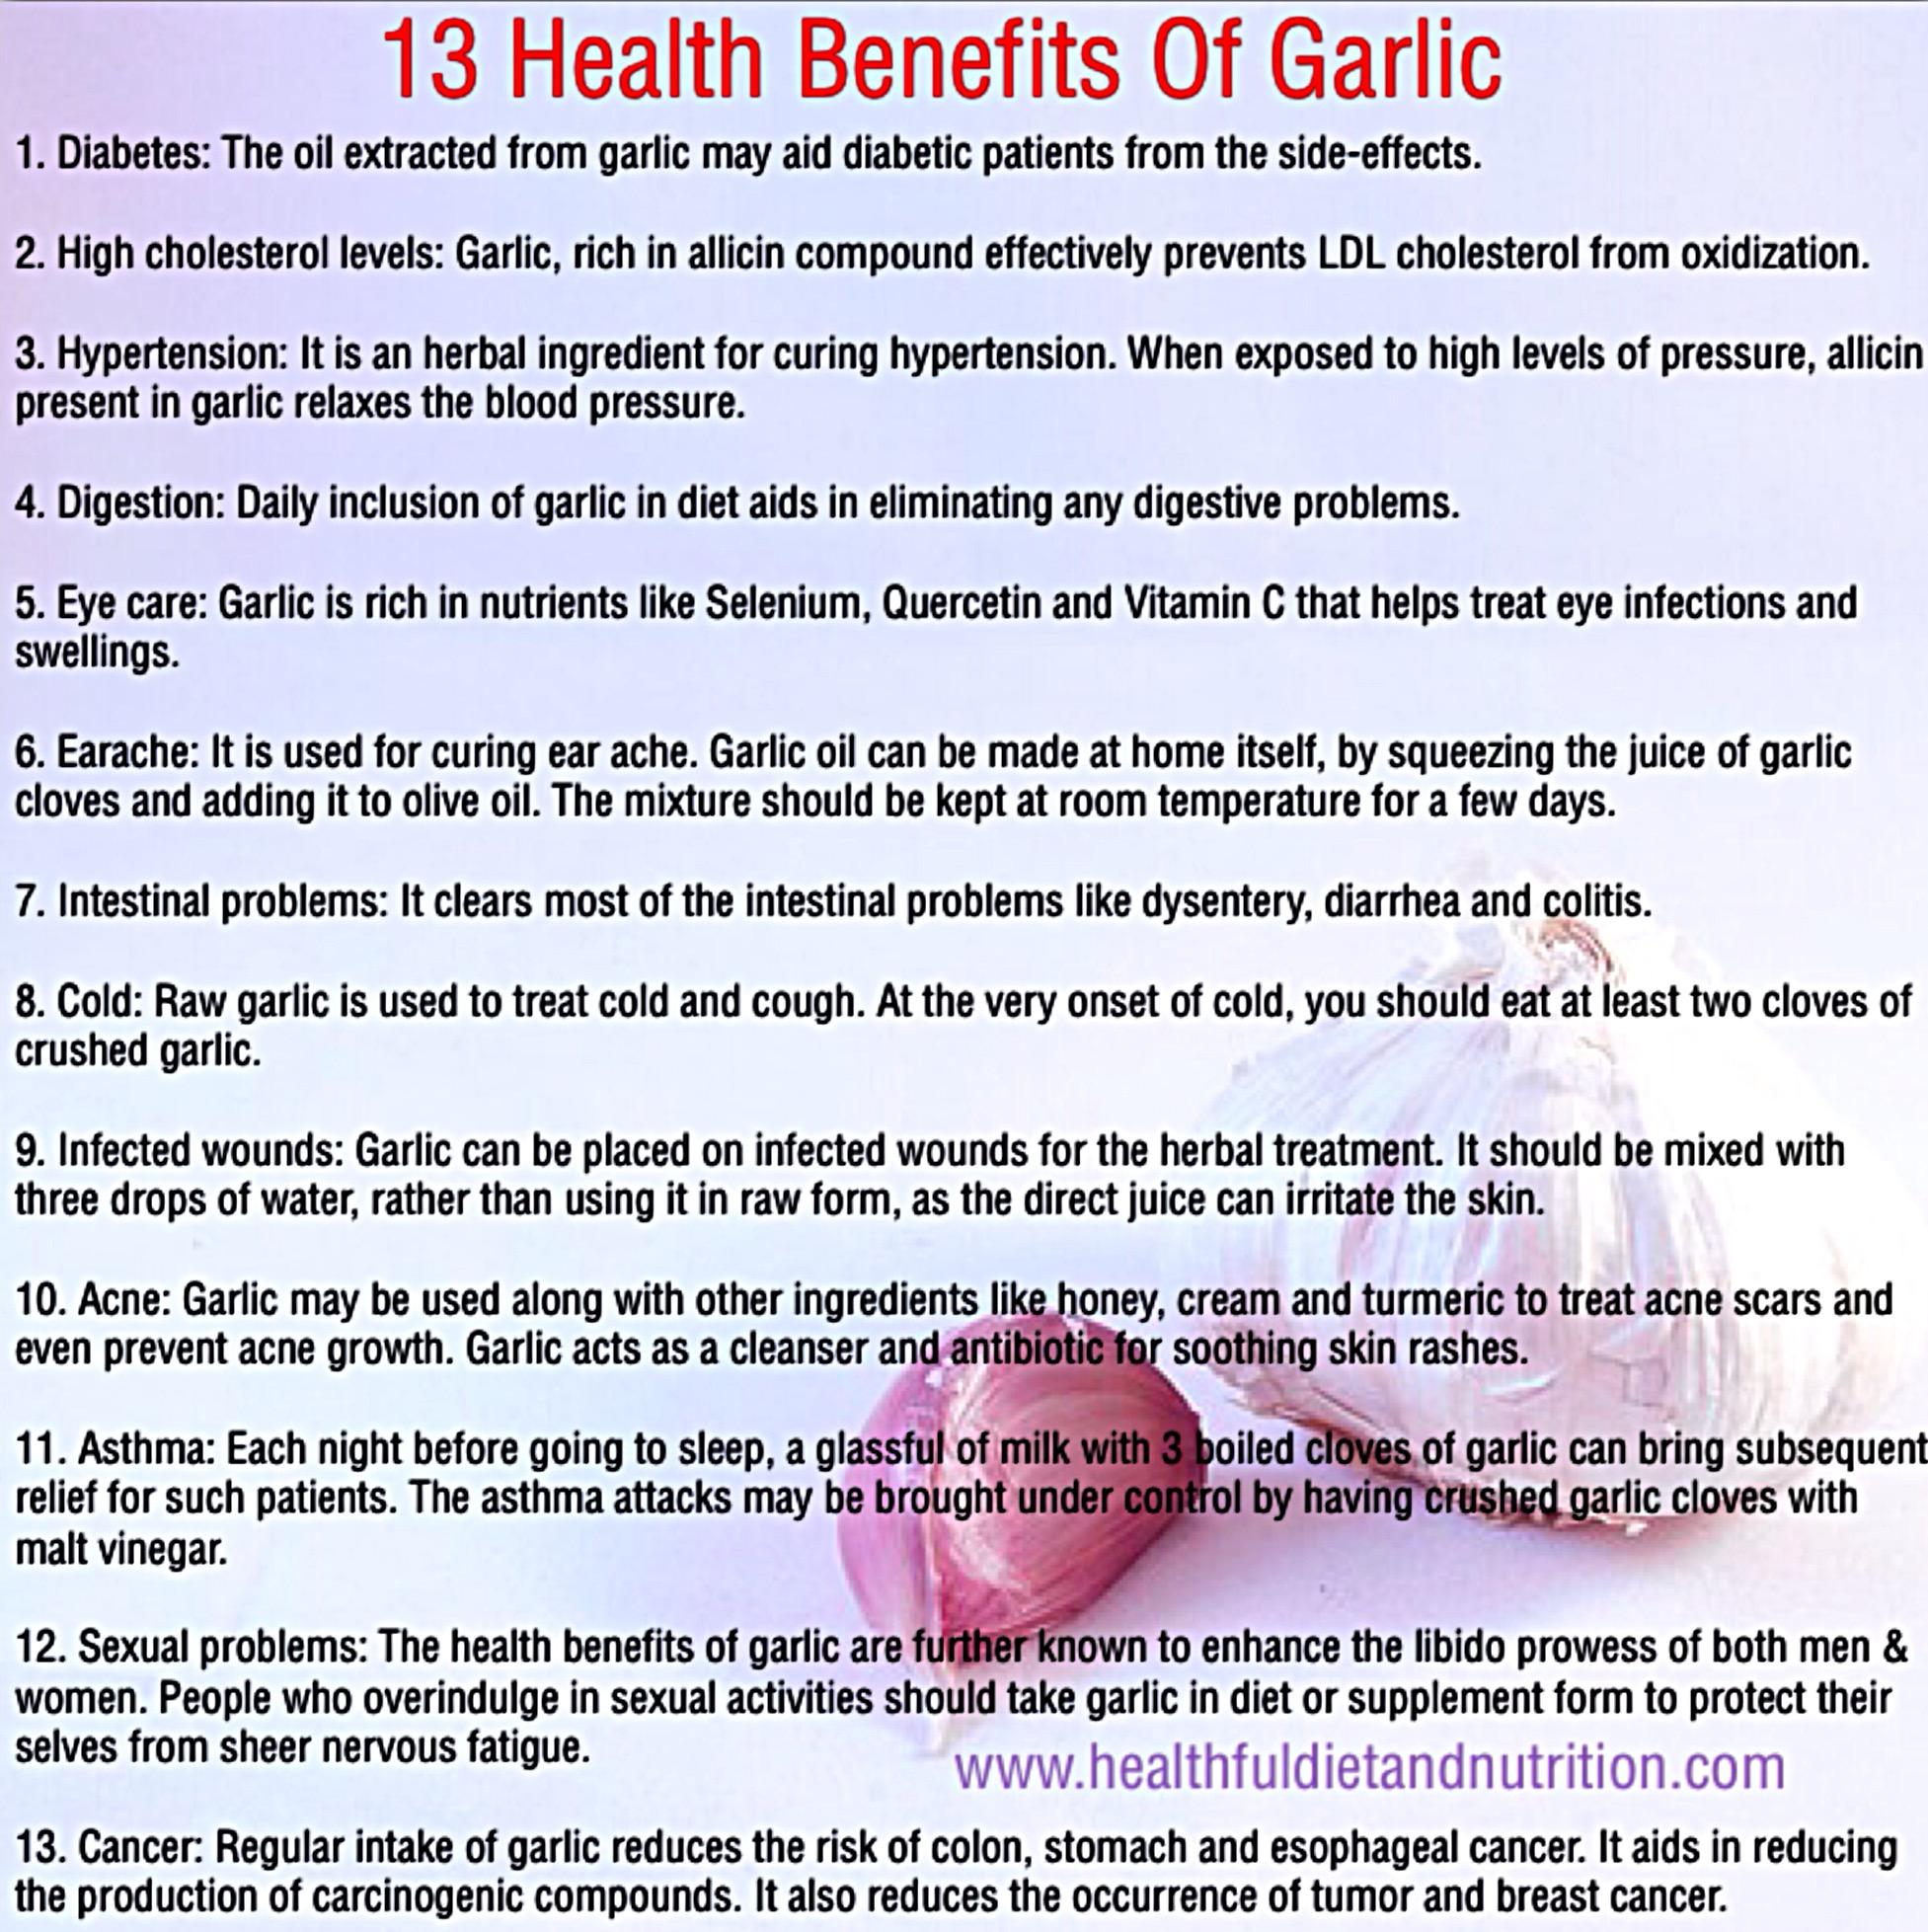 13 Benefits Of Garlic